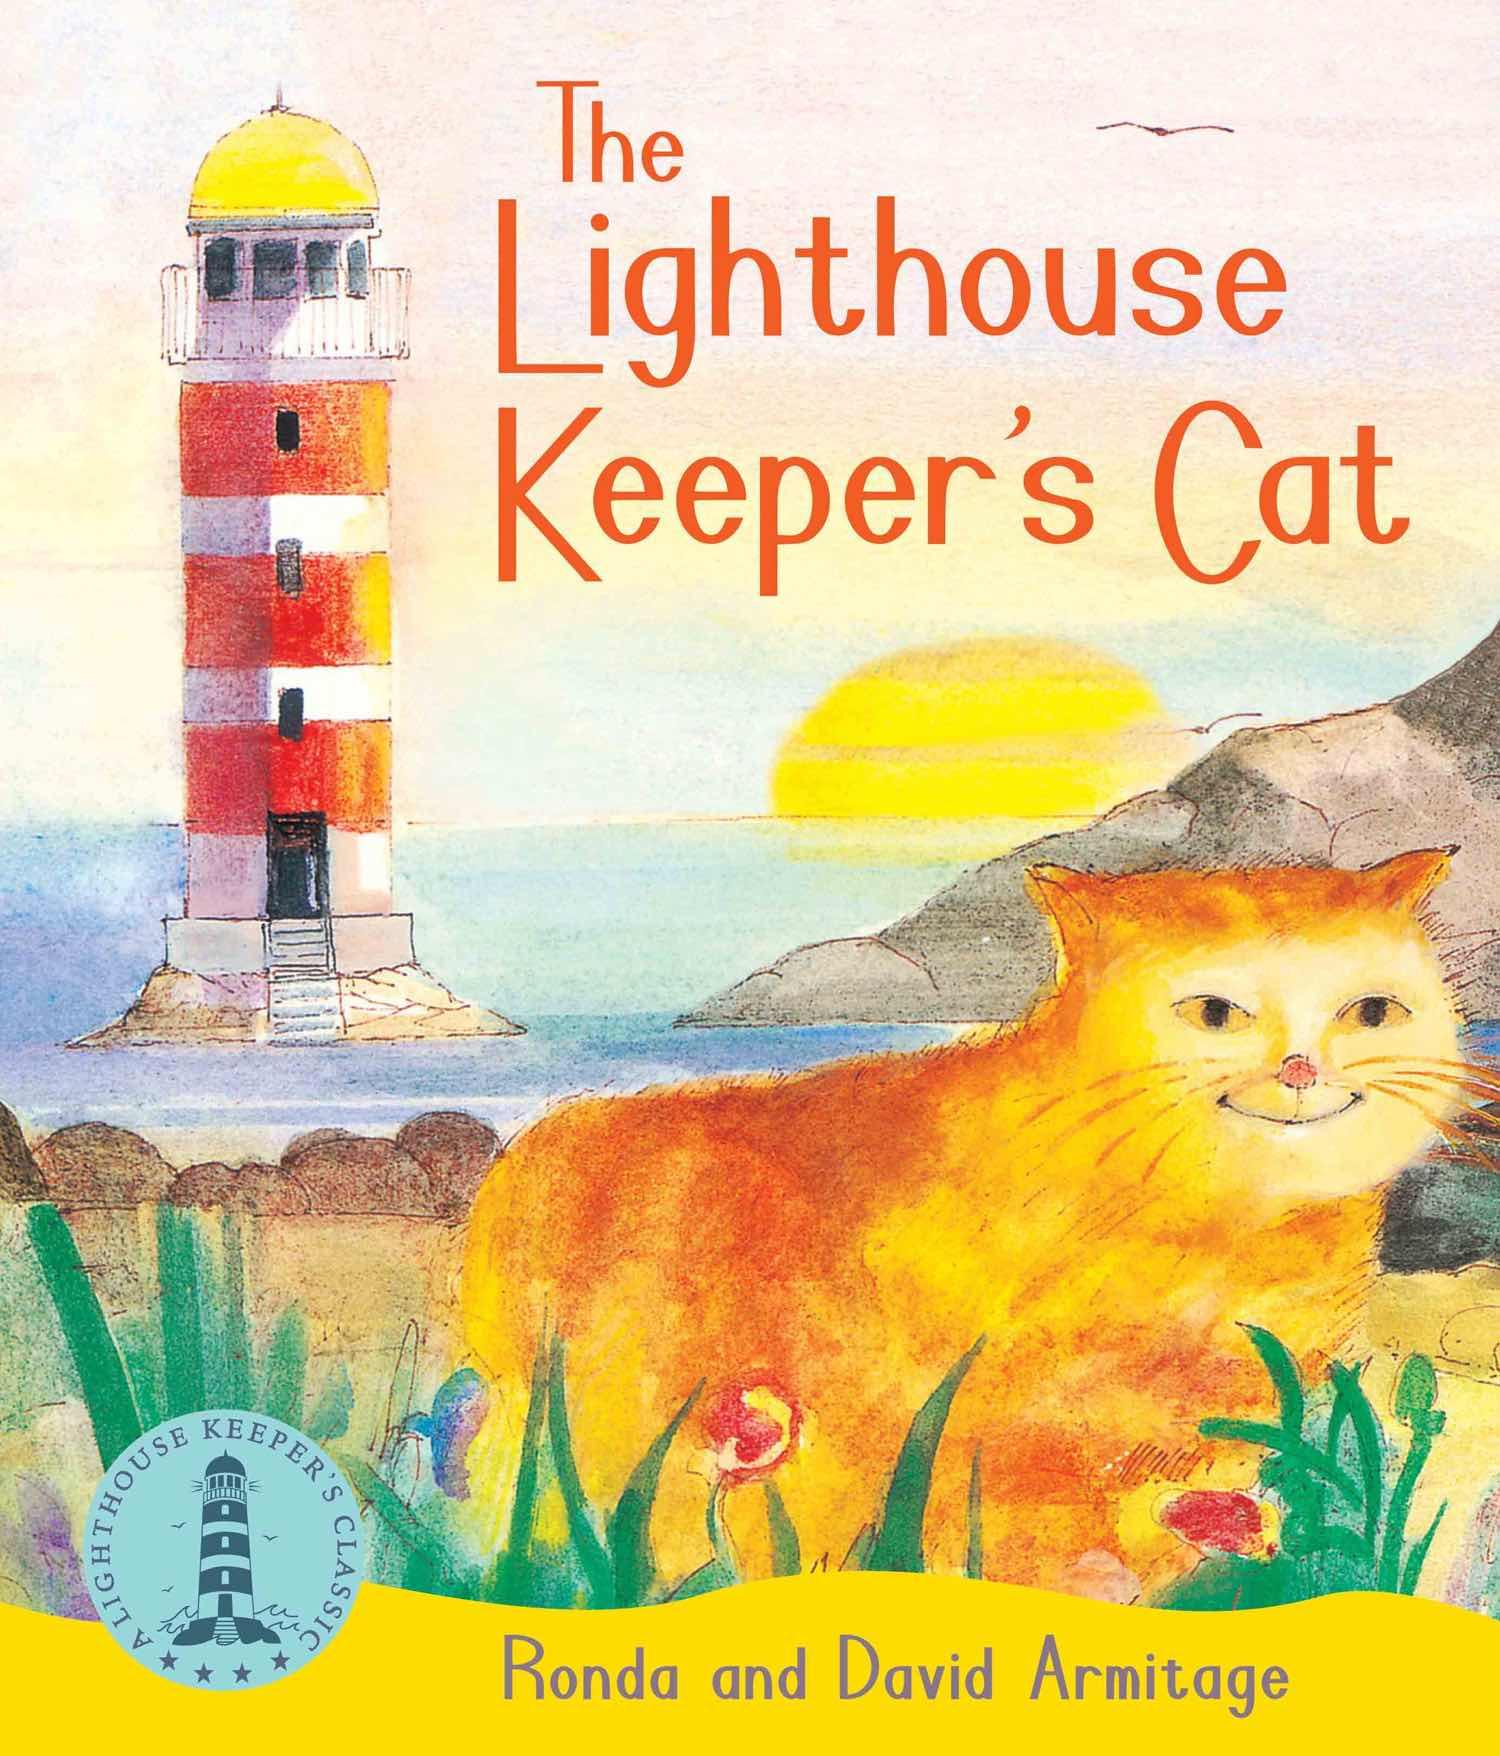 LightKeep_Cat _resize(1).jpg